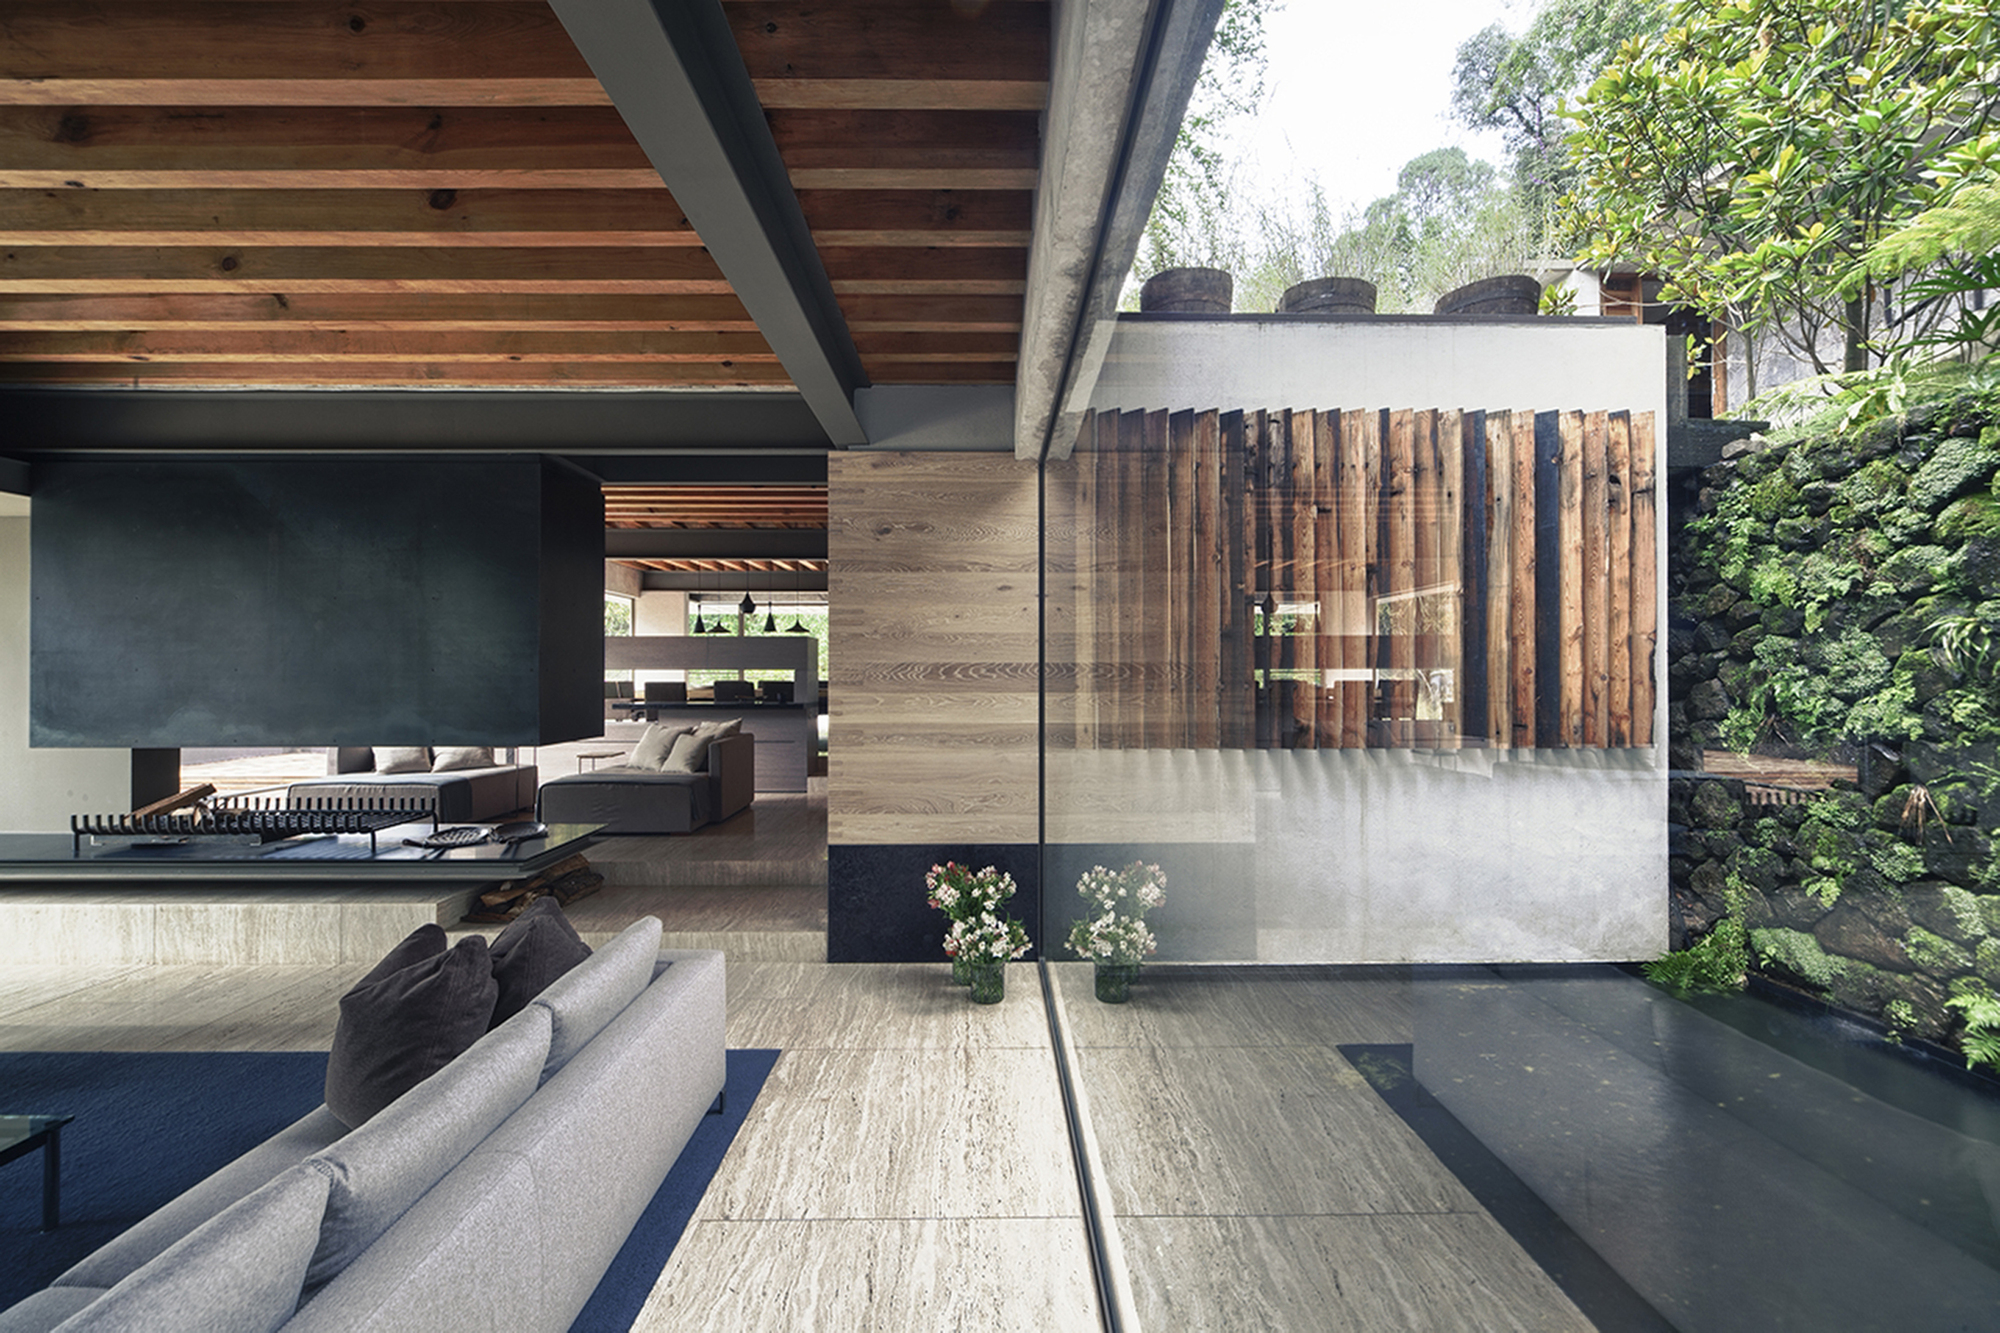 530eb7a4c07a80ed3b000157_house-maza-chk-arquitectura_2014_02_18_mz_fotos_yoshihiro_2280px_ancho_-20-